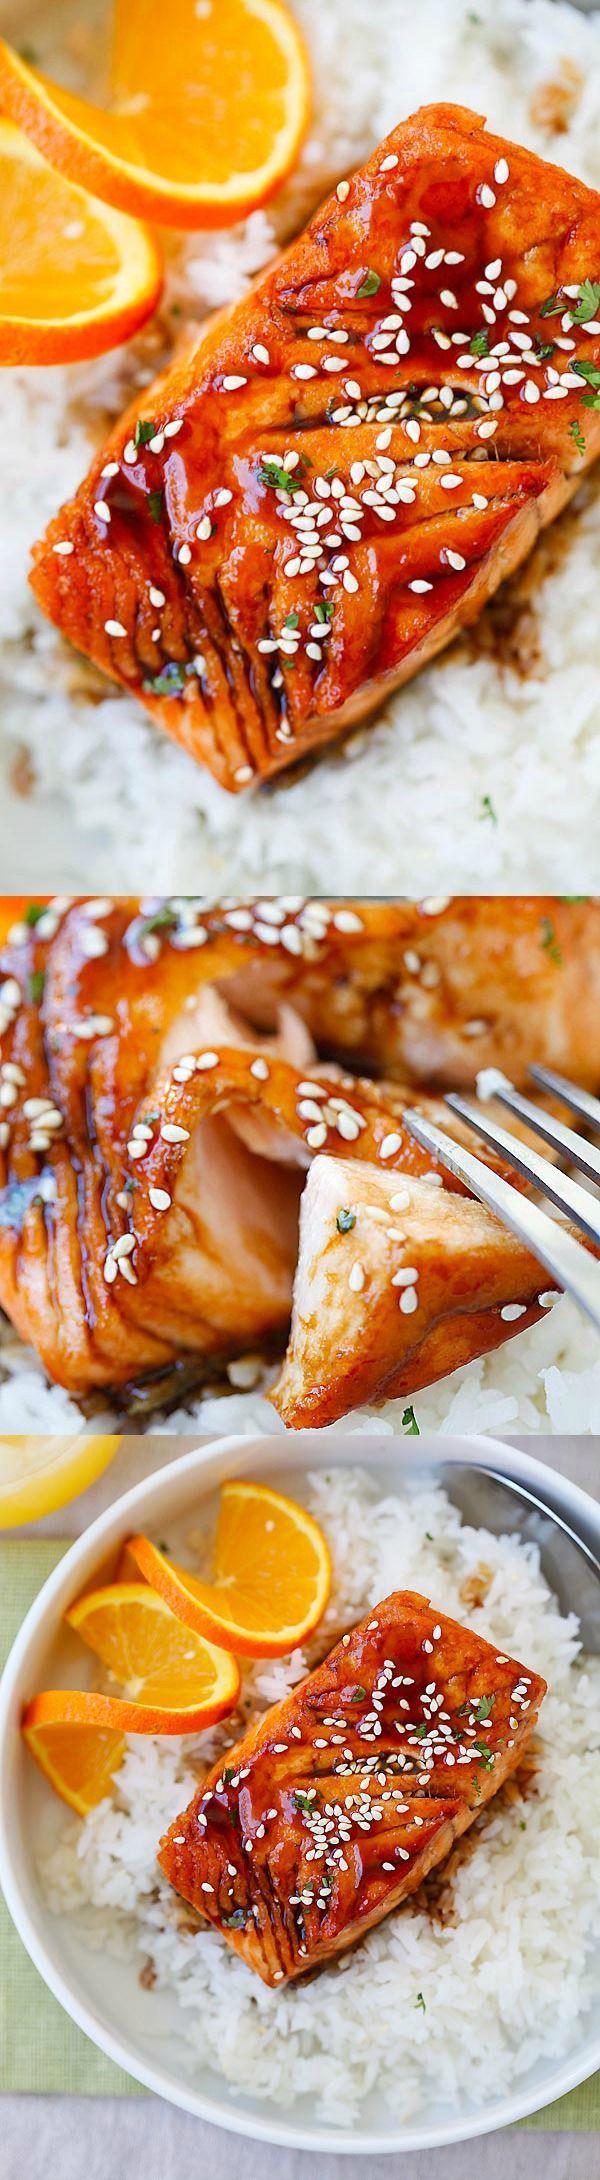 Salmon with Orange Teriyaki Glaze – the easiest and tastiest salmon you'll ever make. Juicy and delicious salmon with orange teriyaki sauce | http://rasamalaysia.com